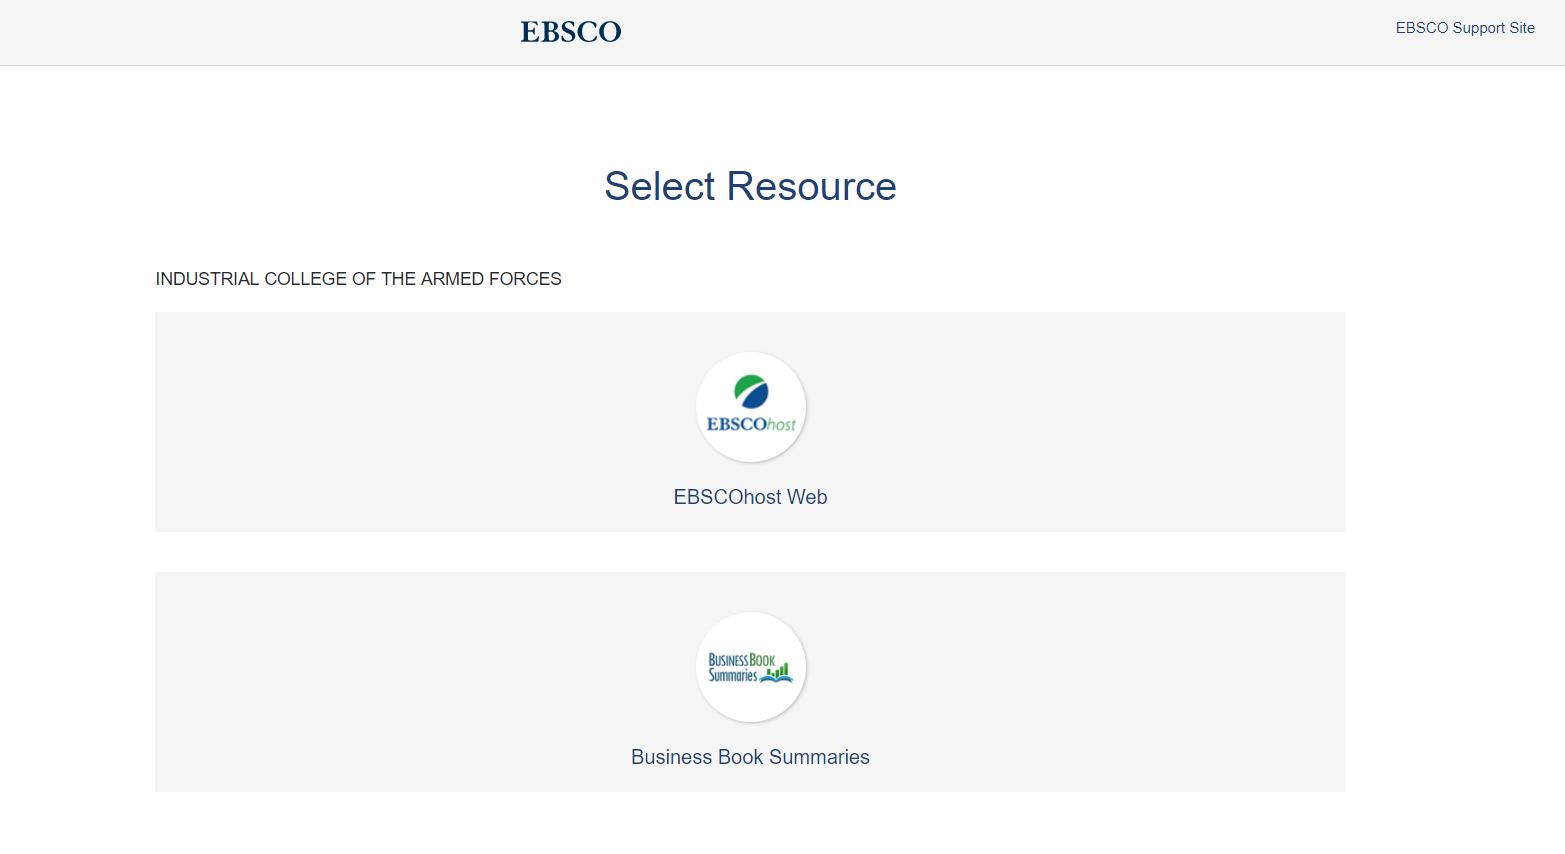 EBSCO log in screen